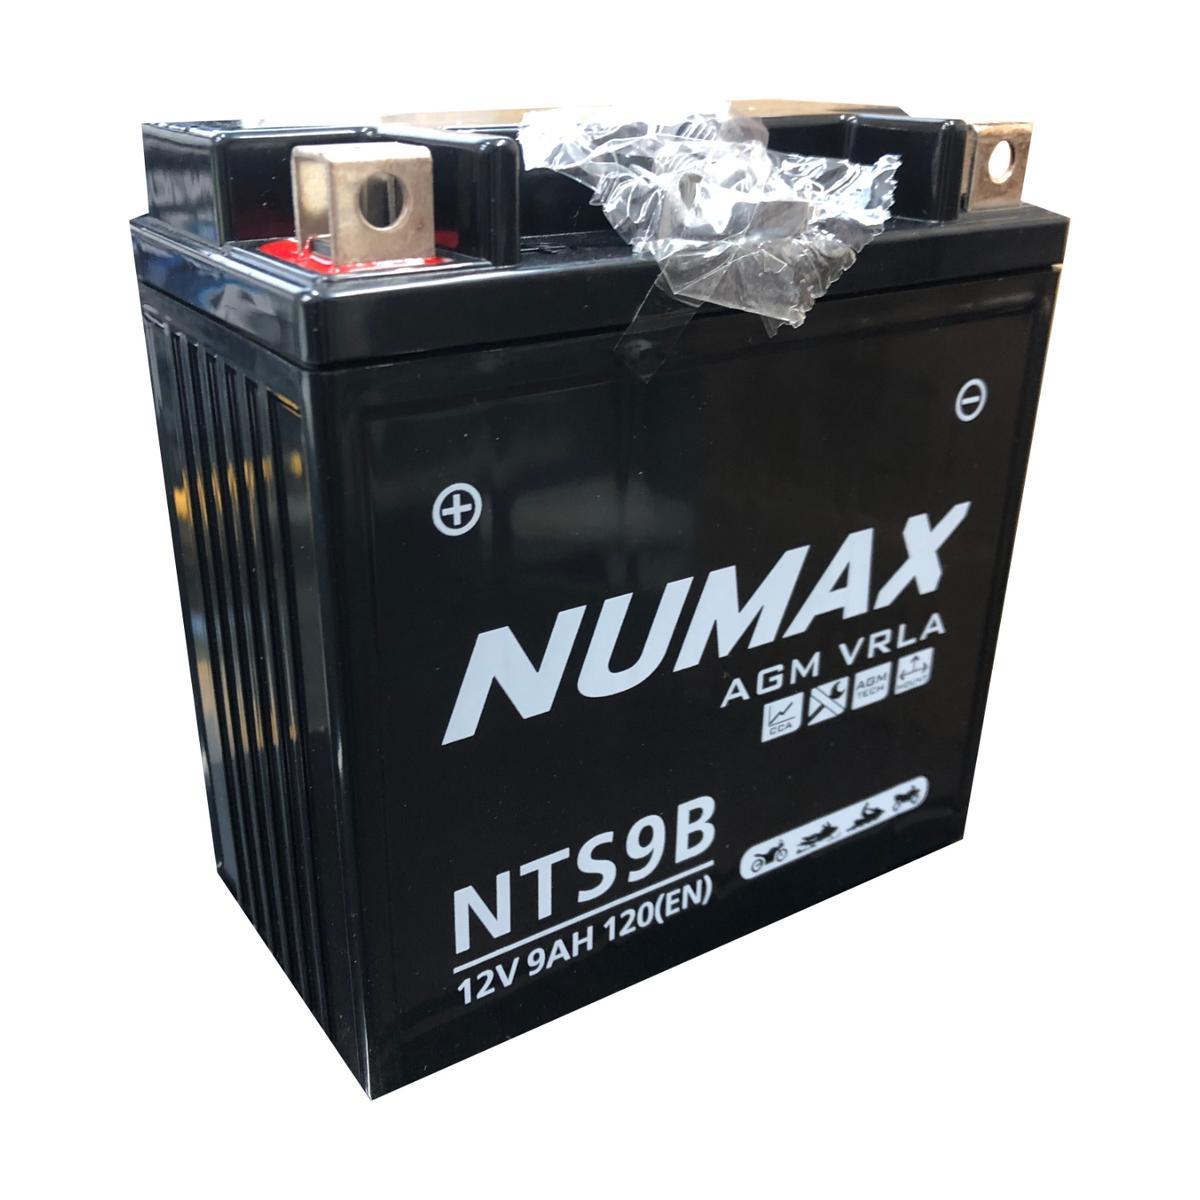 Numax NTS9B 12v Bike Motorbike Motorcycle Battery GILERA 250cc EX150 YB9L-B